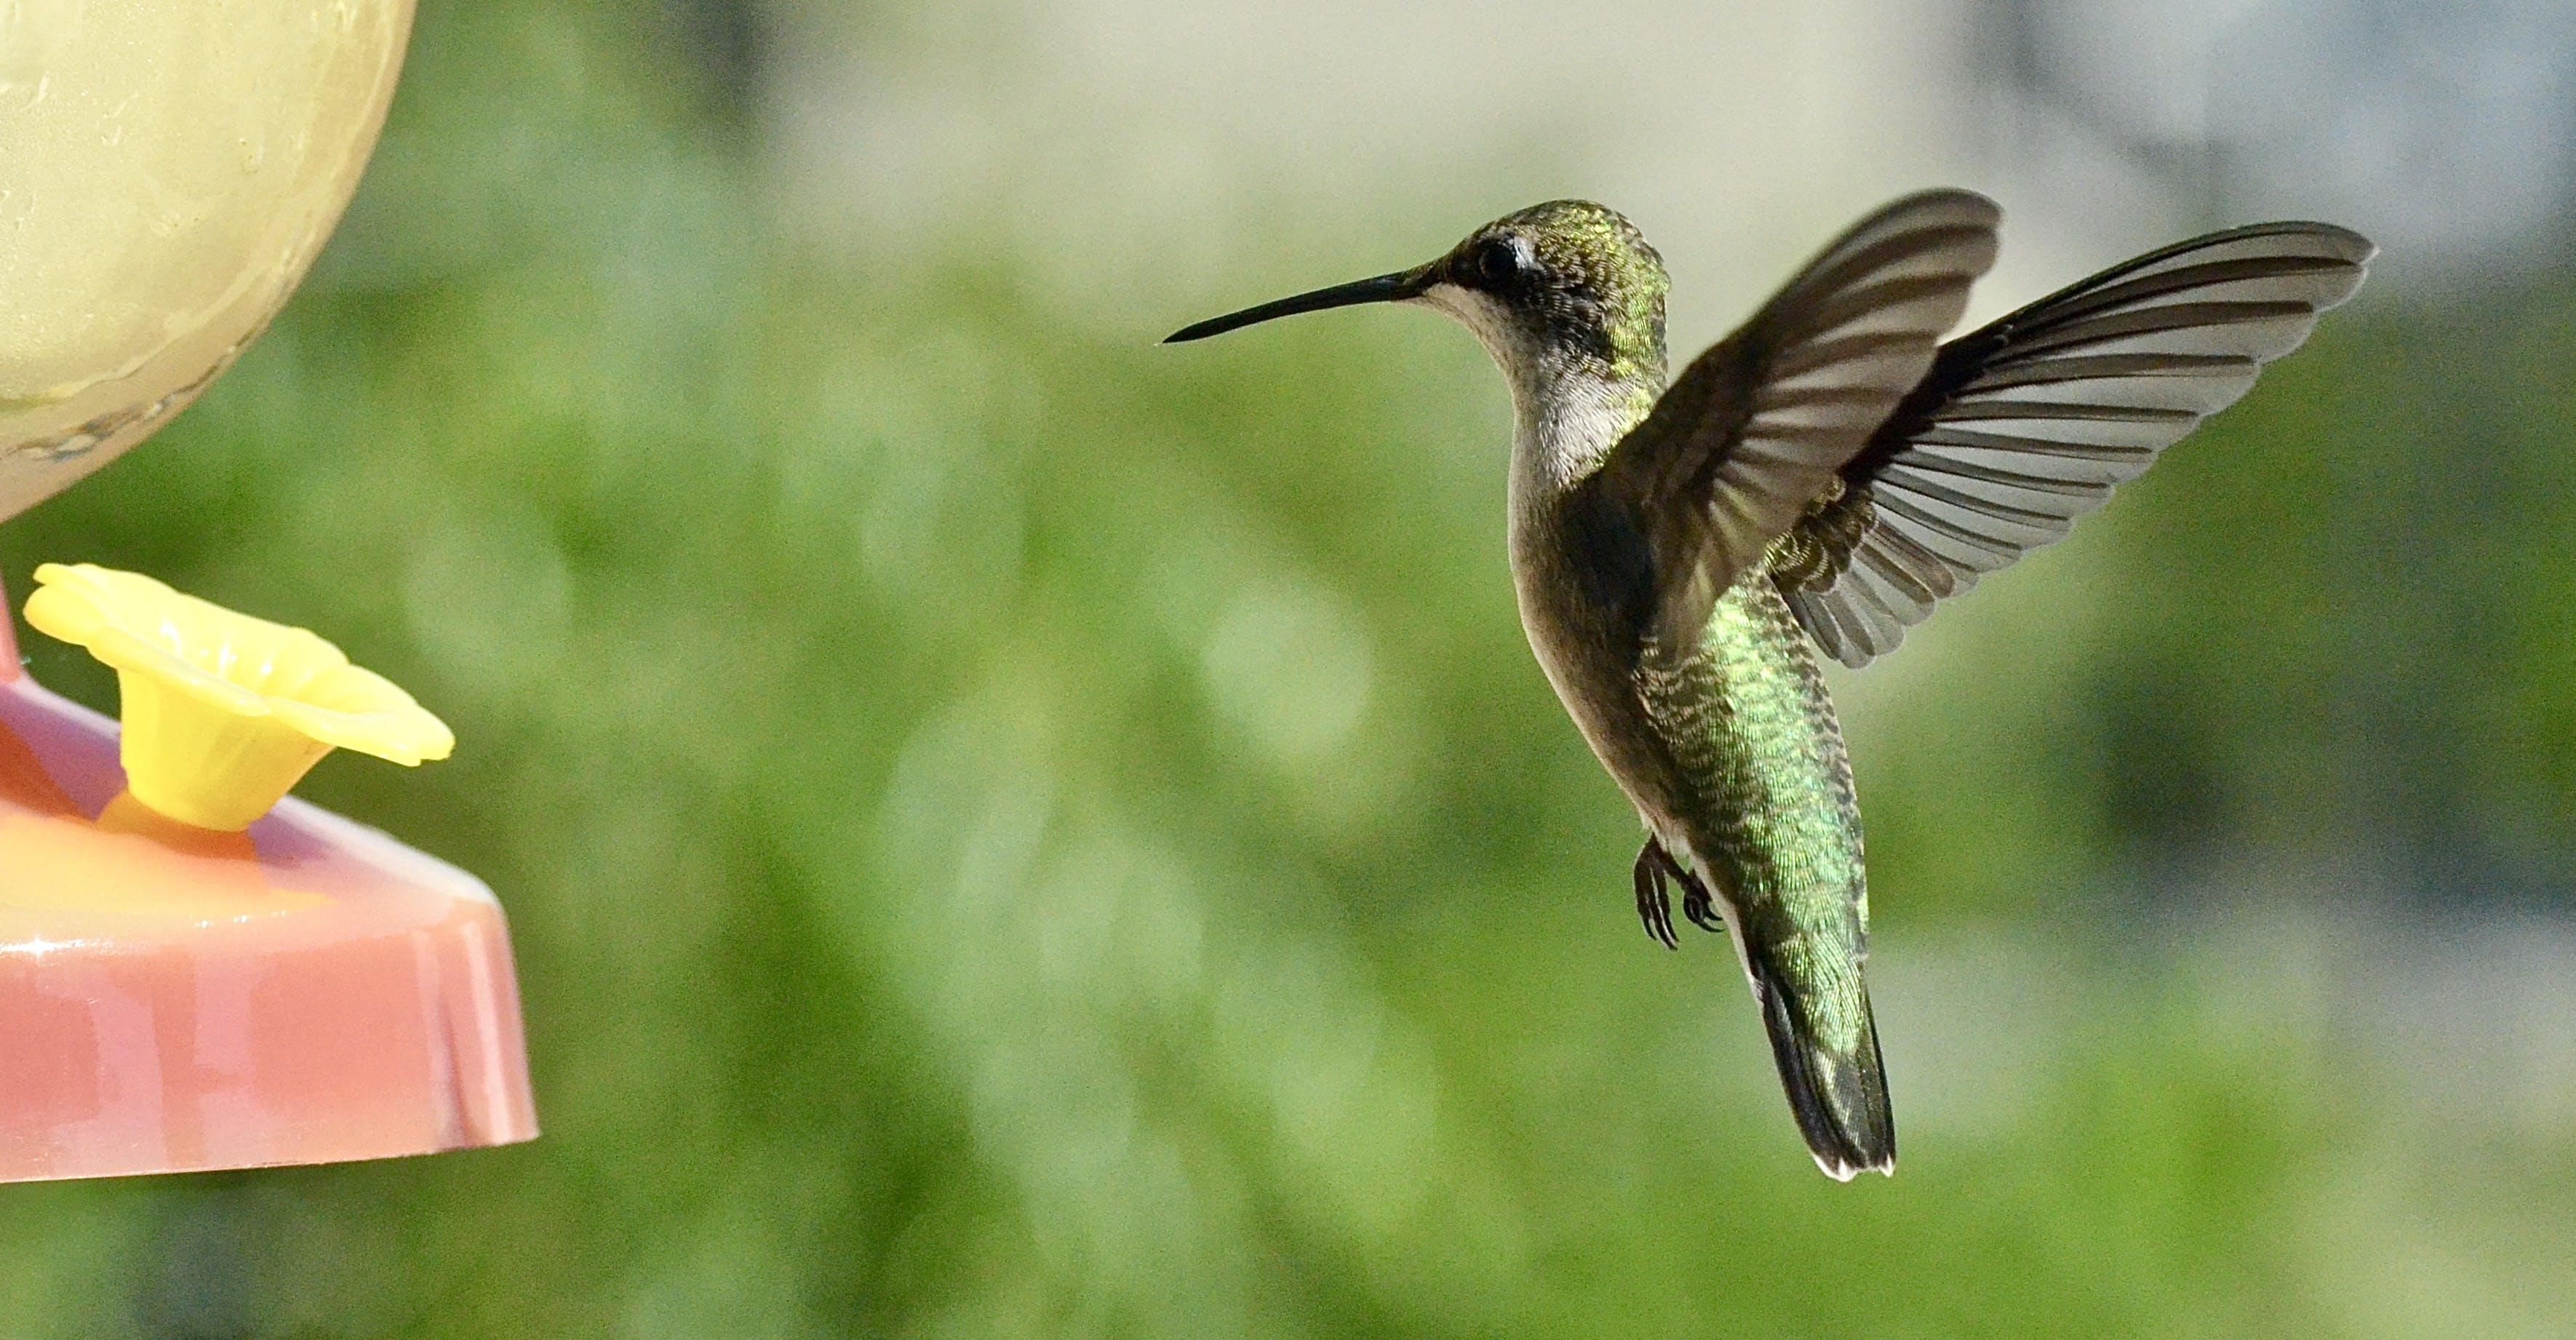 Green Bird Are Flying